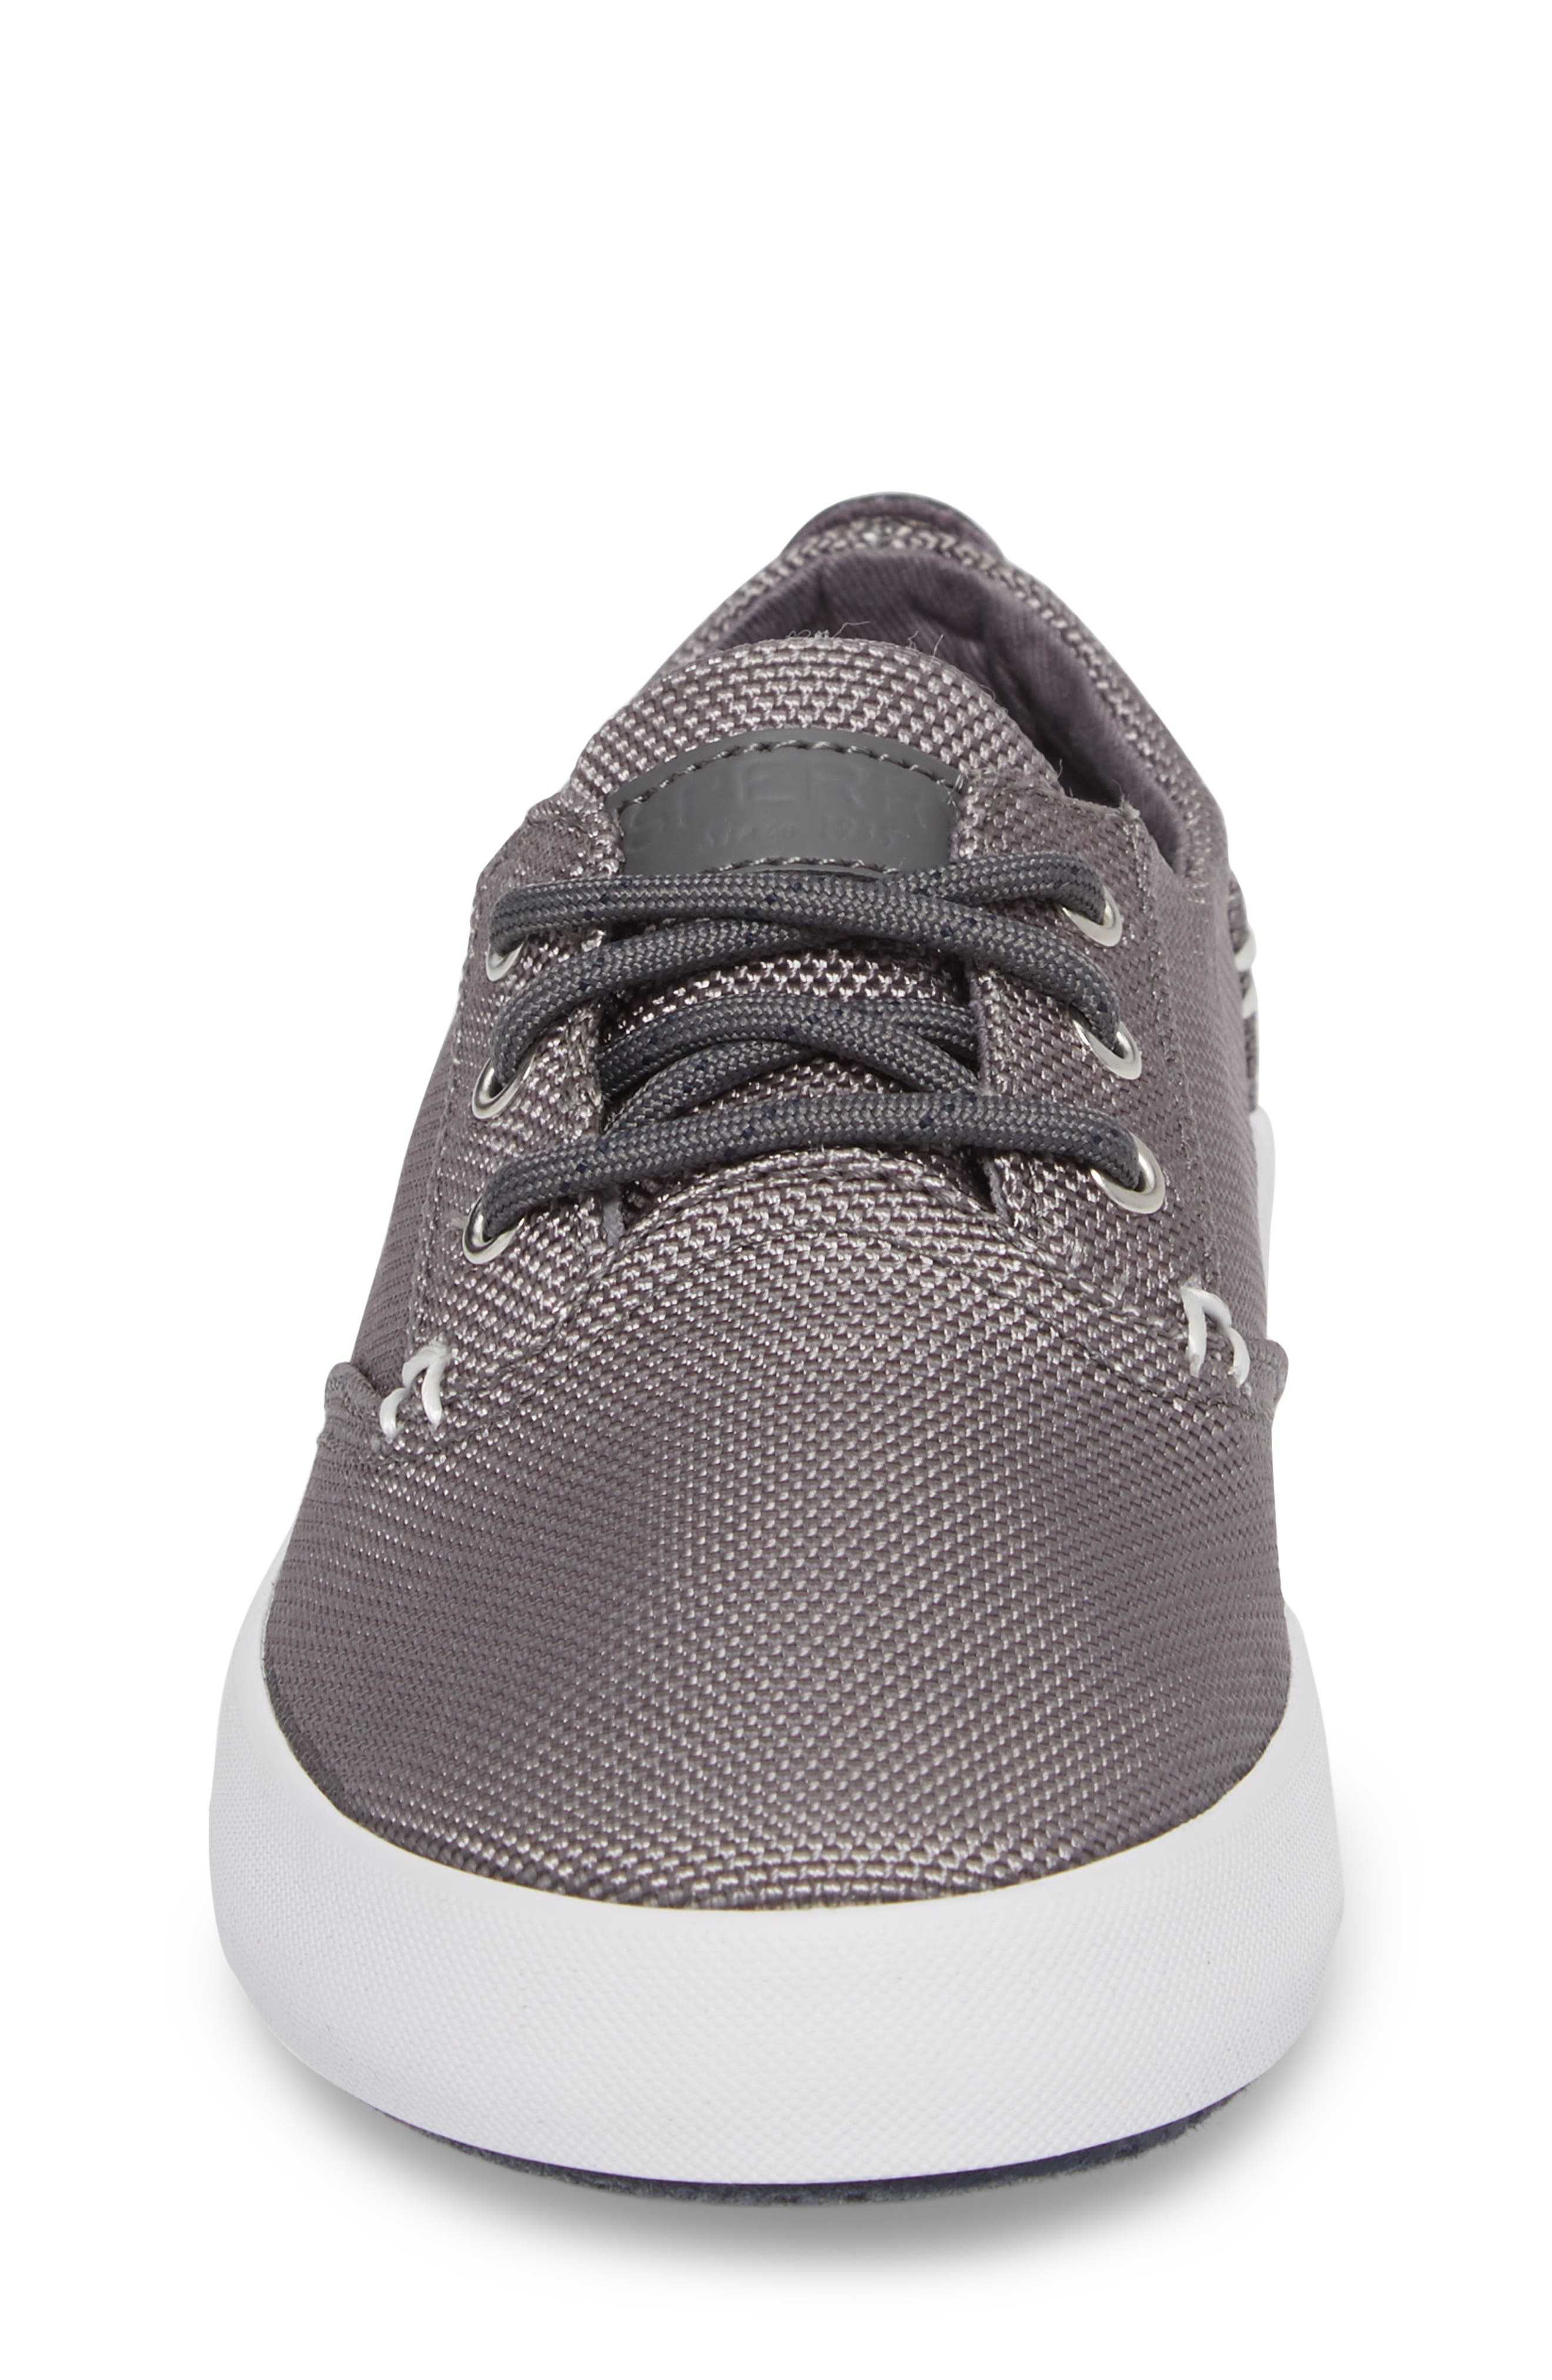 Bodie Sneaker,                             Alternate thumbnail 4, color,                             GREY